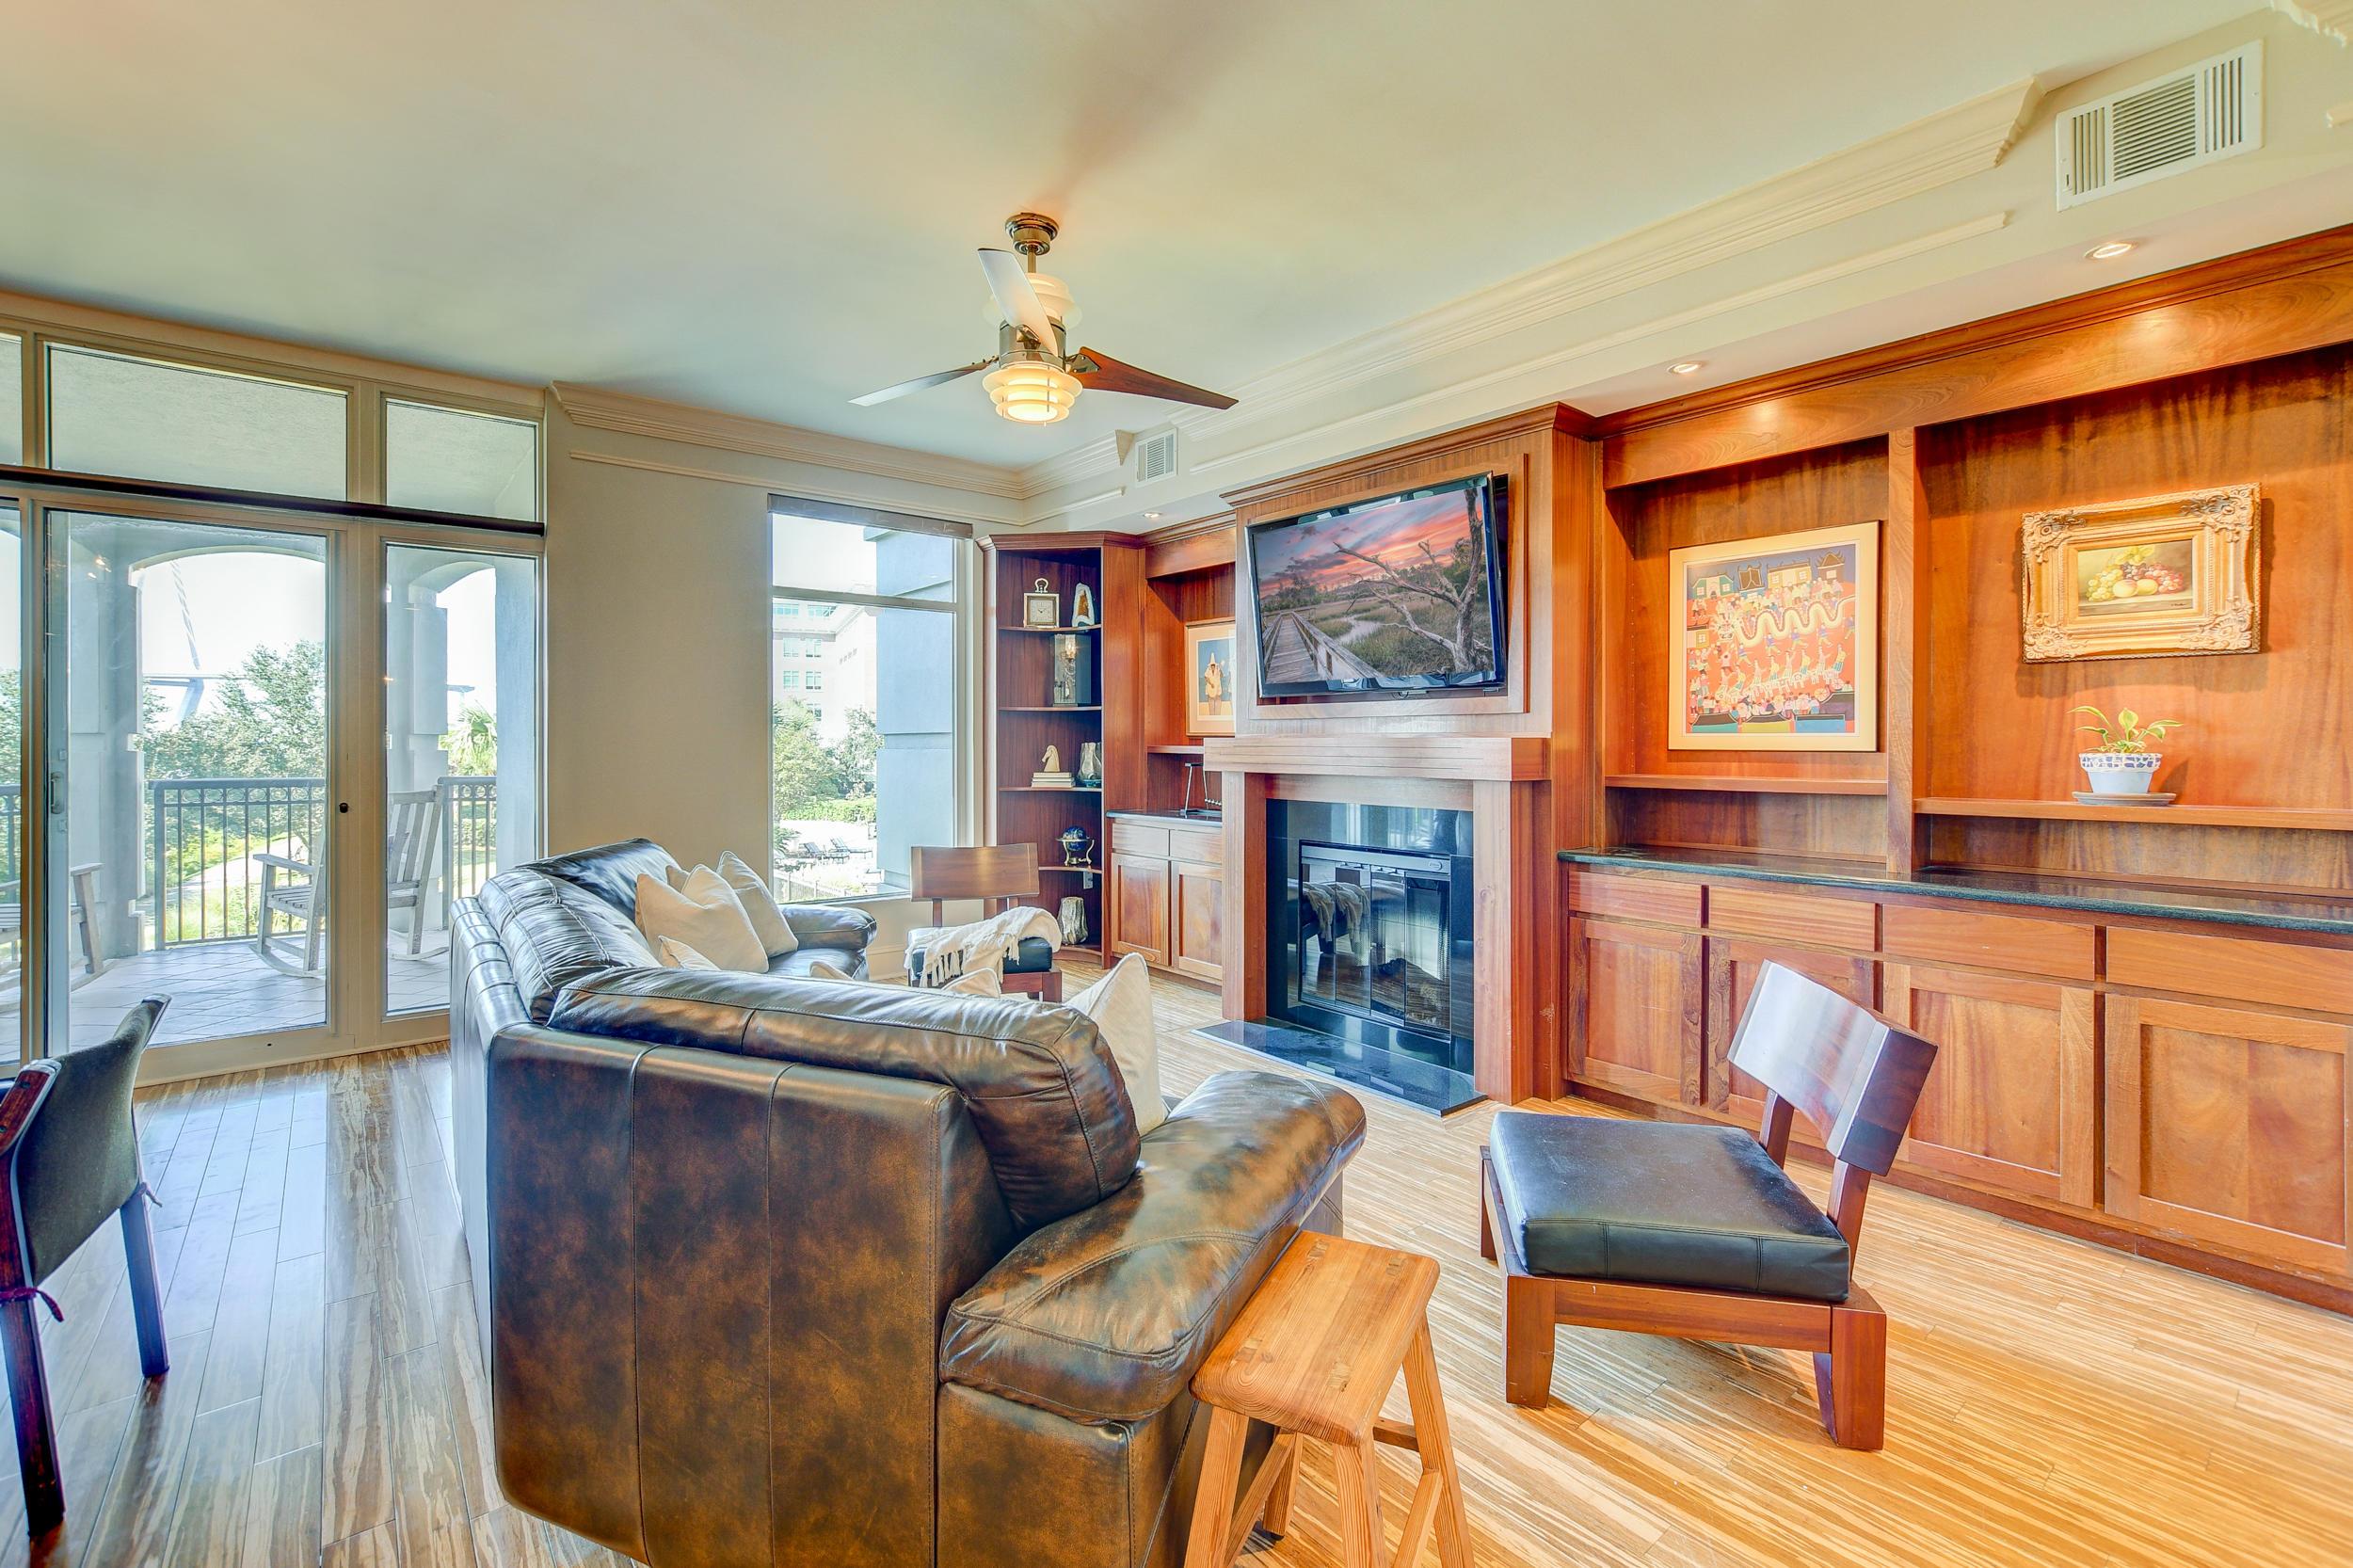 Renaissance On Chas Harbor Homes For Sale - 224 Plaza, Mount Pleasant, SC - 39